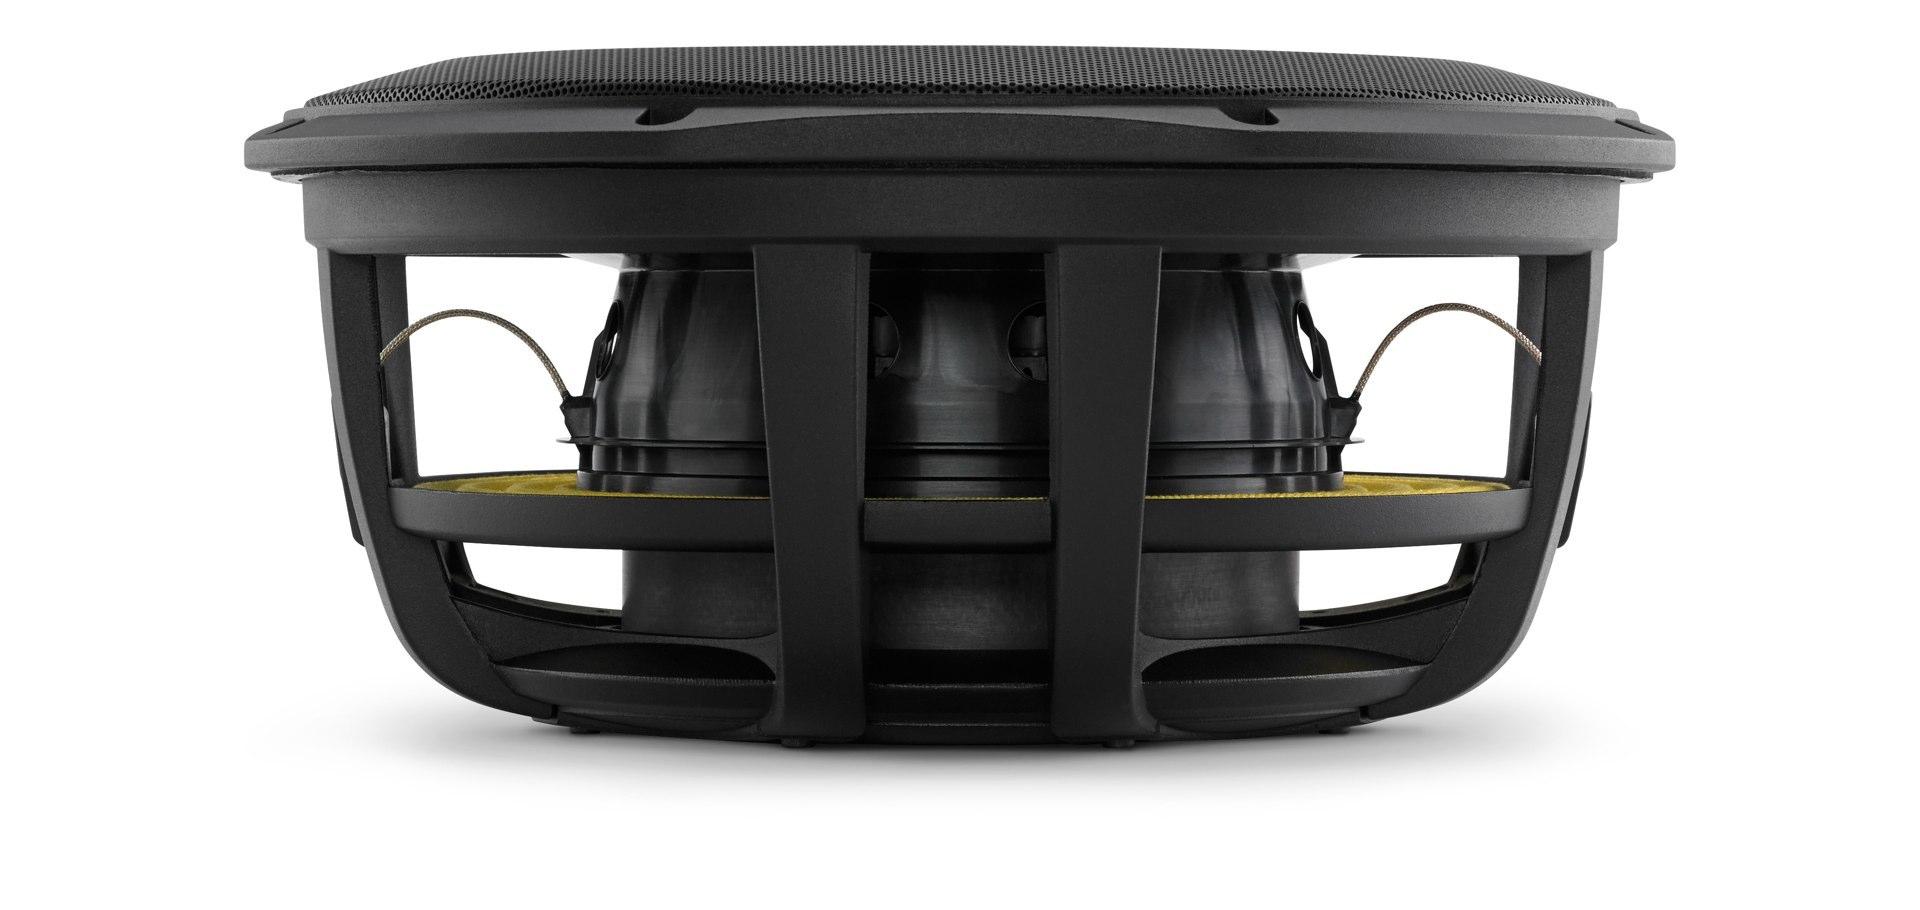 jl audio auto subwoofer flach 300w 4ohm 12tw1 4. Black Bedroom Furniture Sets. Home Design Ideas